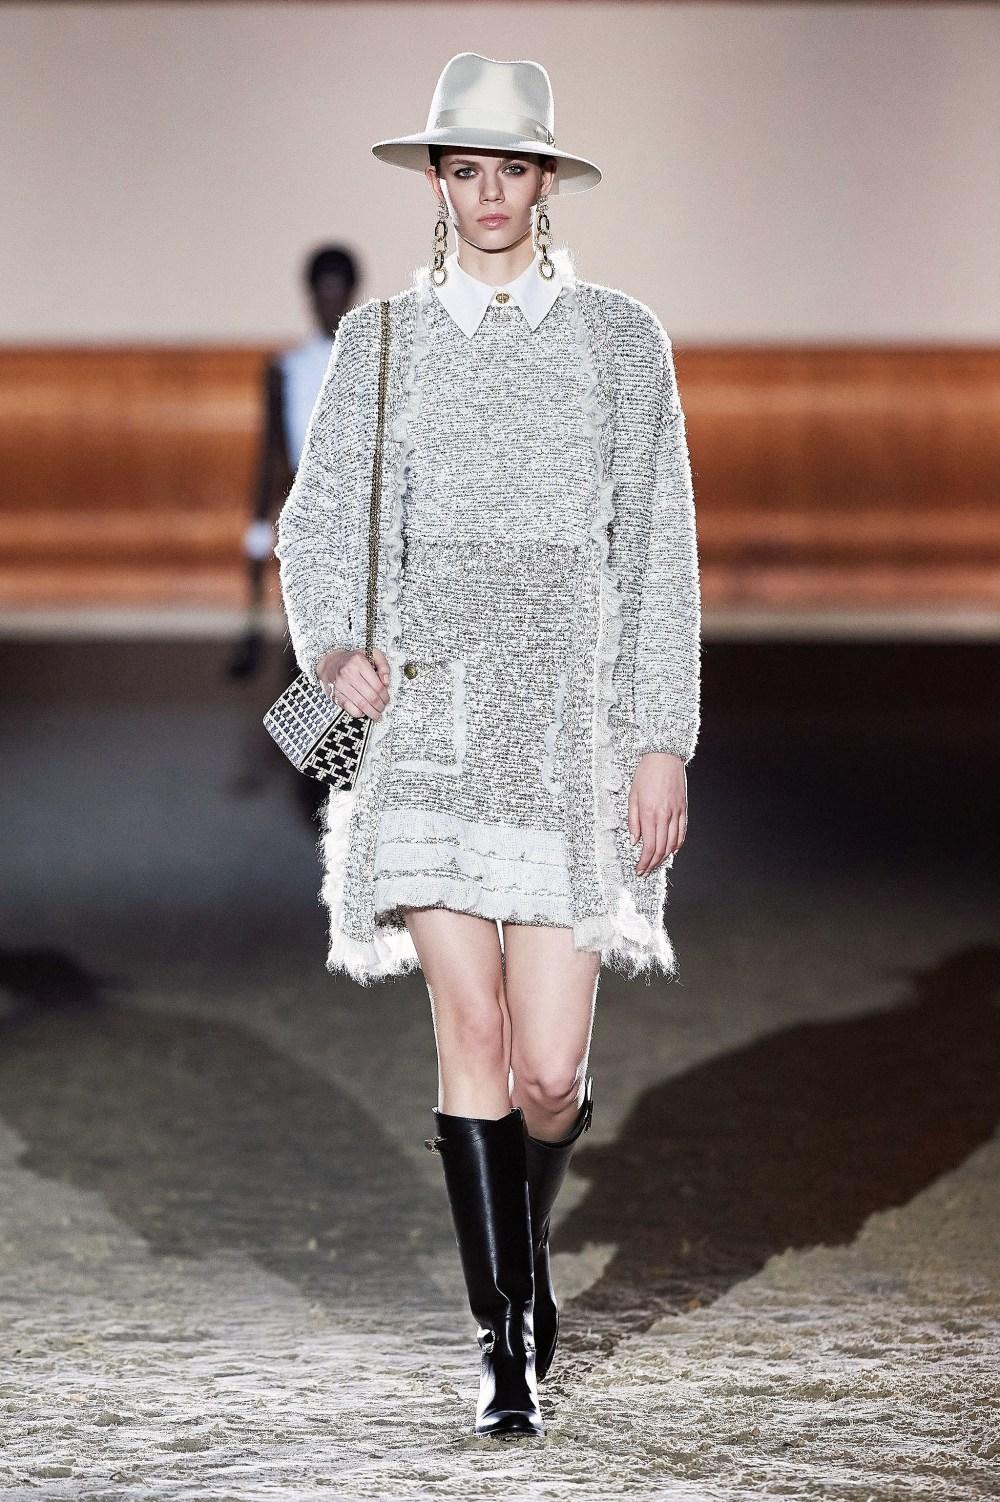 Elisabetta Franchi: Elisabetta Franchi Fall Winter 2021-22 Fashion Show Photo #53